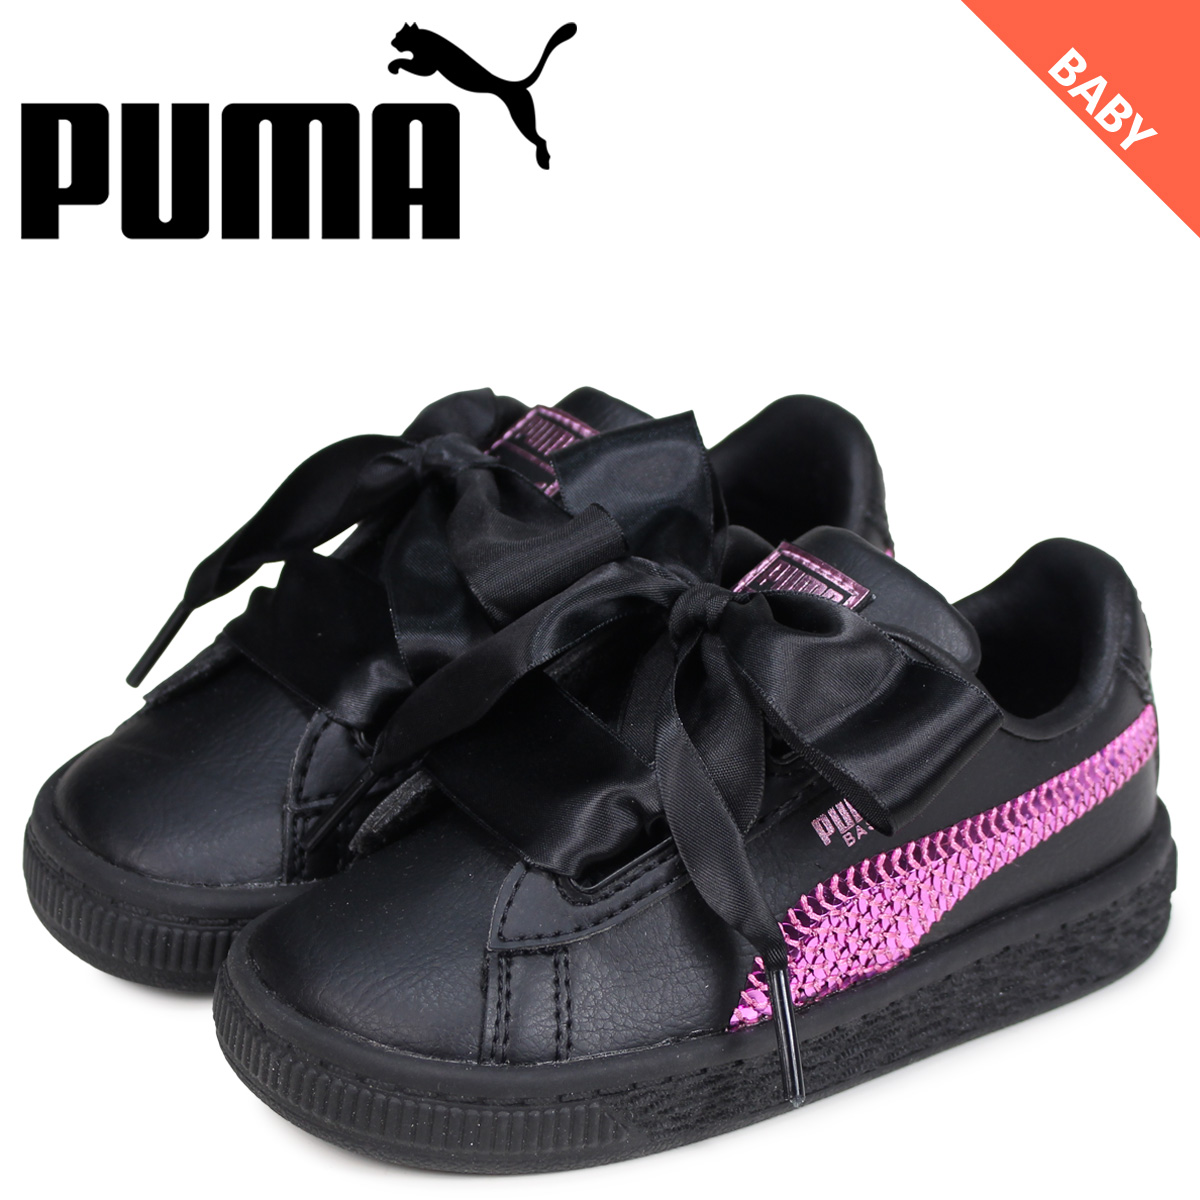 huge discount 907b1 0efe9 PUMA Puma basket heart sneakers kids baby BASKET HEART BLING INF black  black 36684901